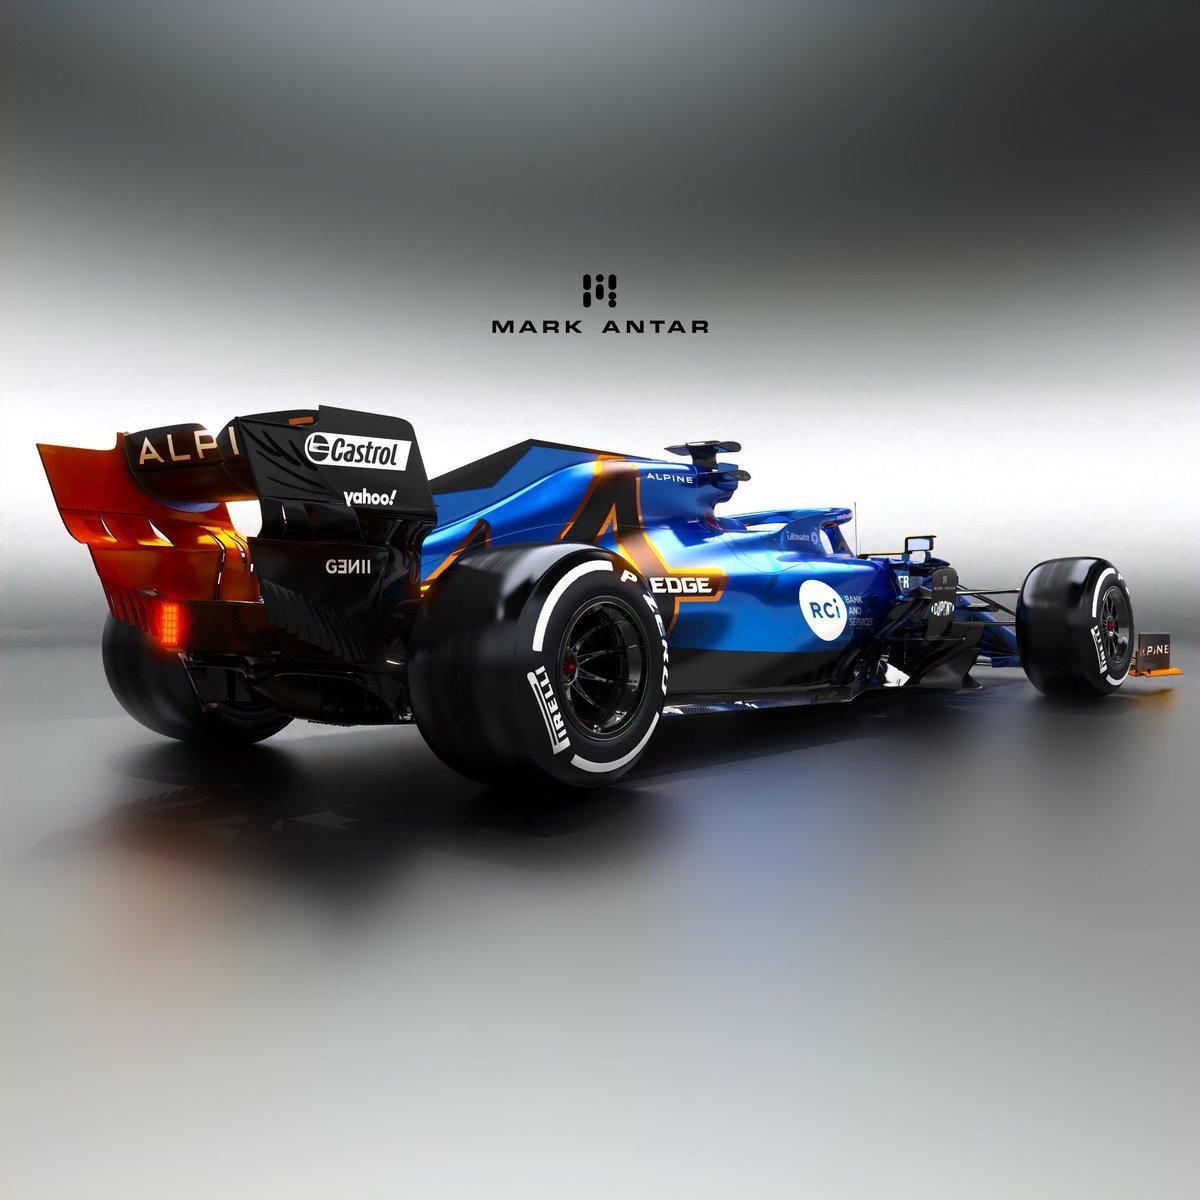 Mark Antar Design On Twitter More Angles Of My Alpine F1 Livery Renaultf1 F1 Liverydesign Alpine